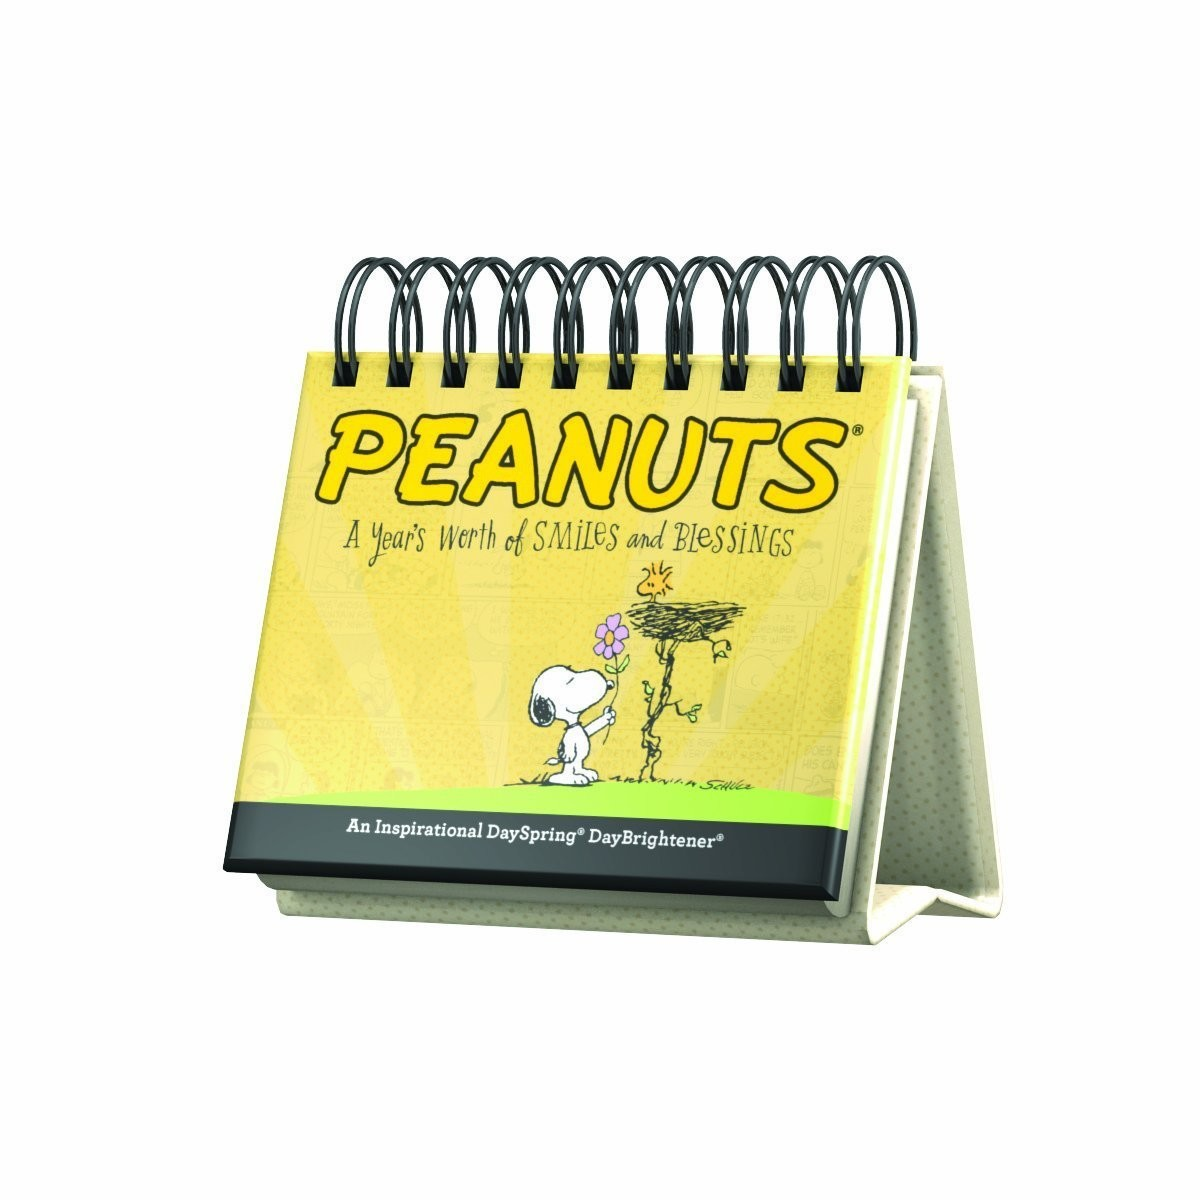 DayBrightener - Peanuts